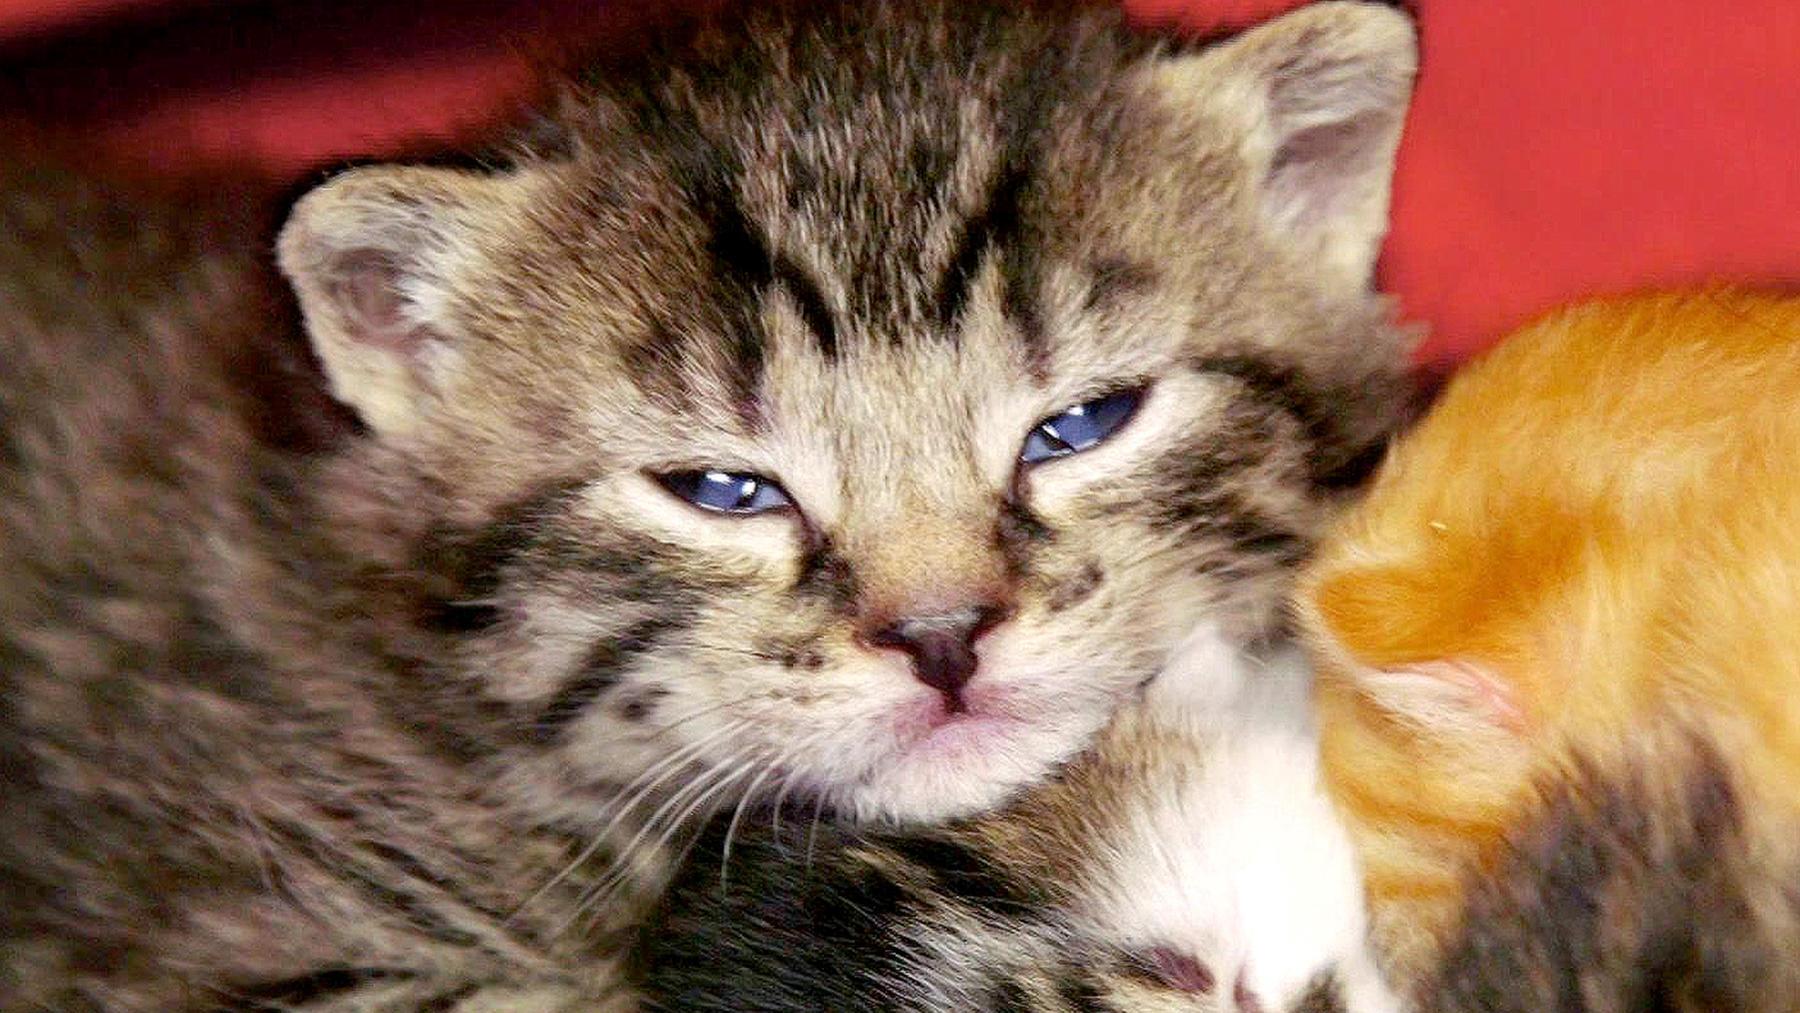 Thema heute u.a.: Rettung für Katzenkinder | Folge 4